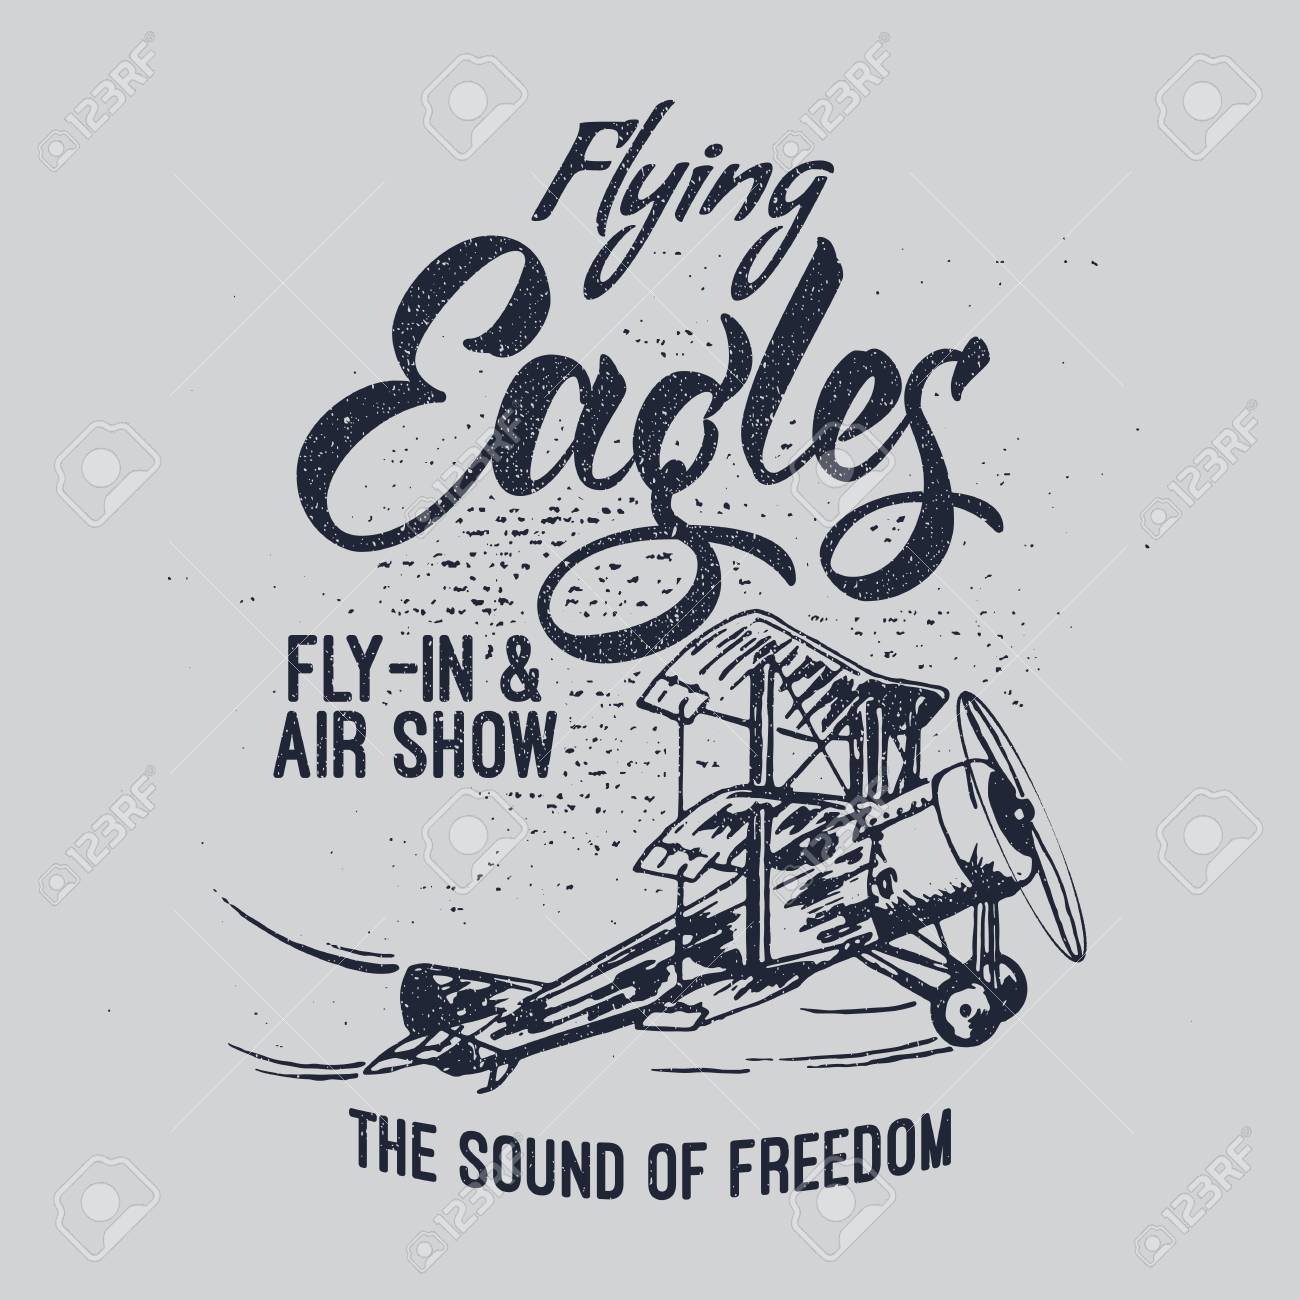 Flying Eagles air show vector illustration. Typography design aerobatic retro airplane. - 96537083